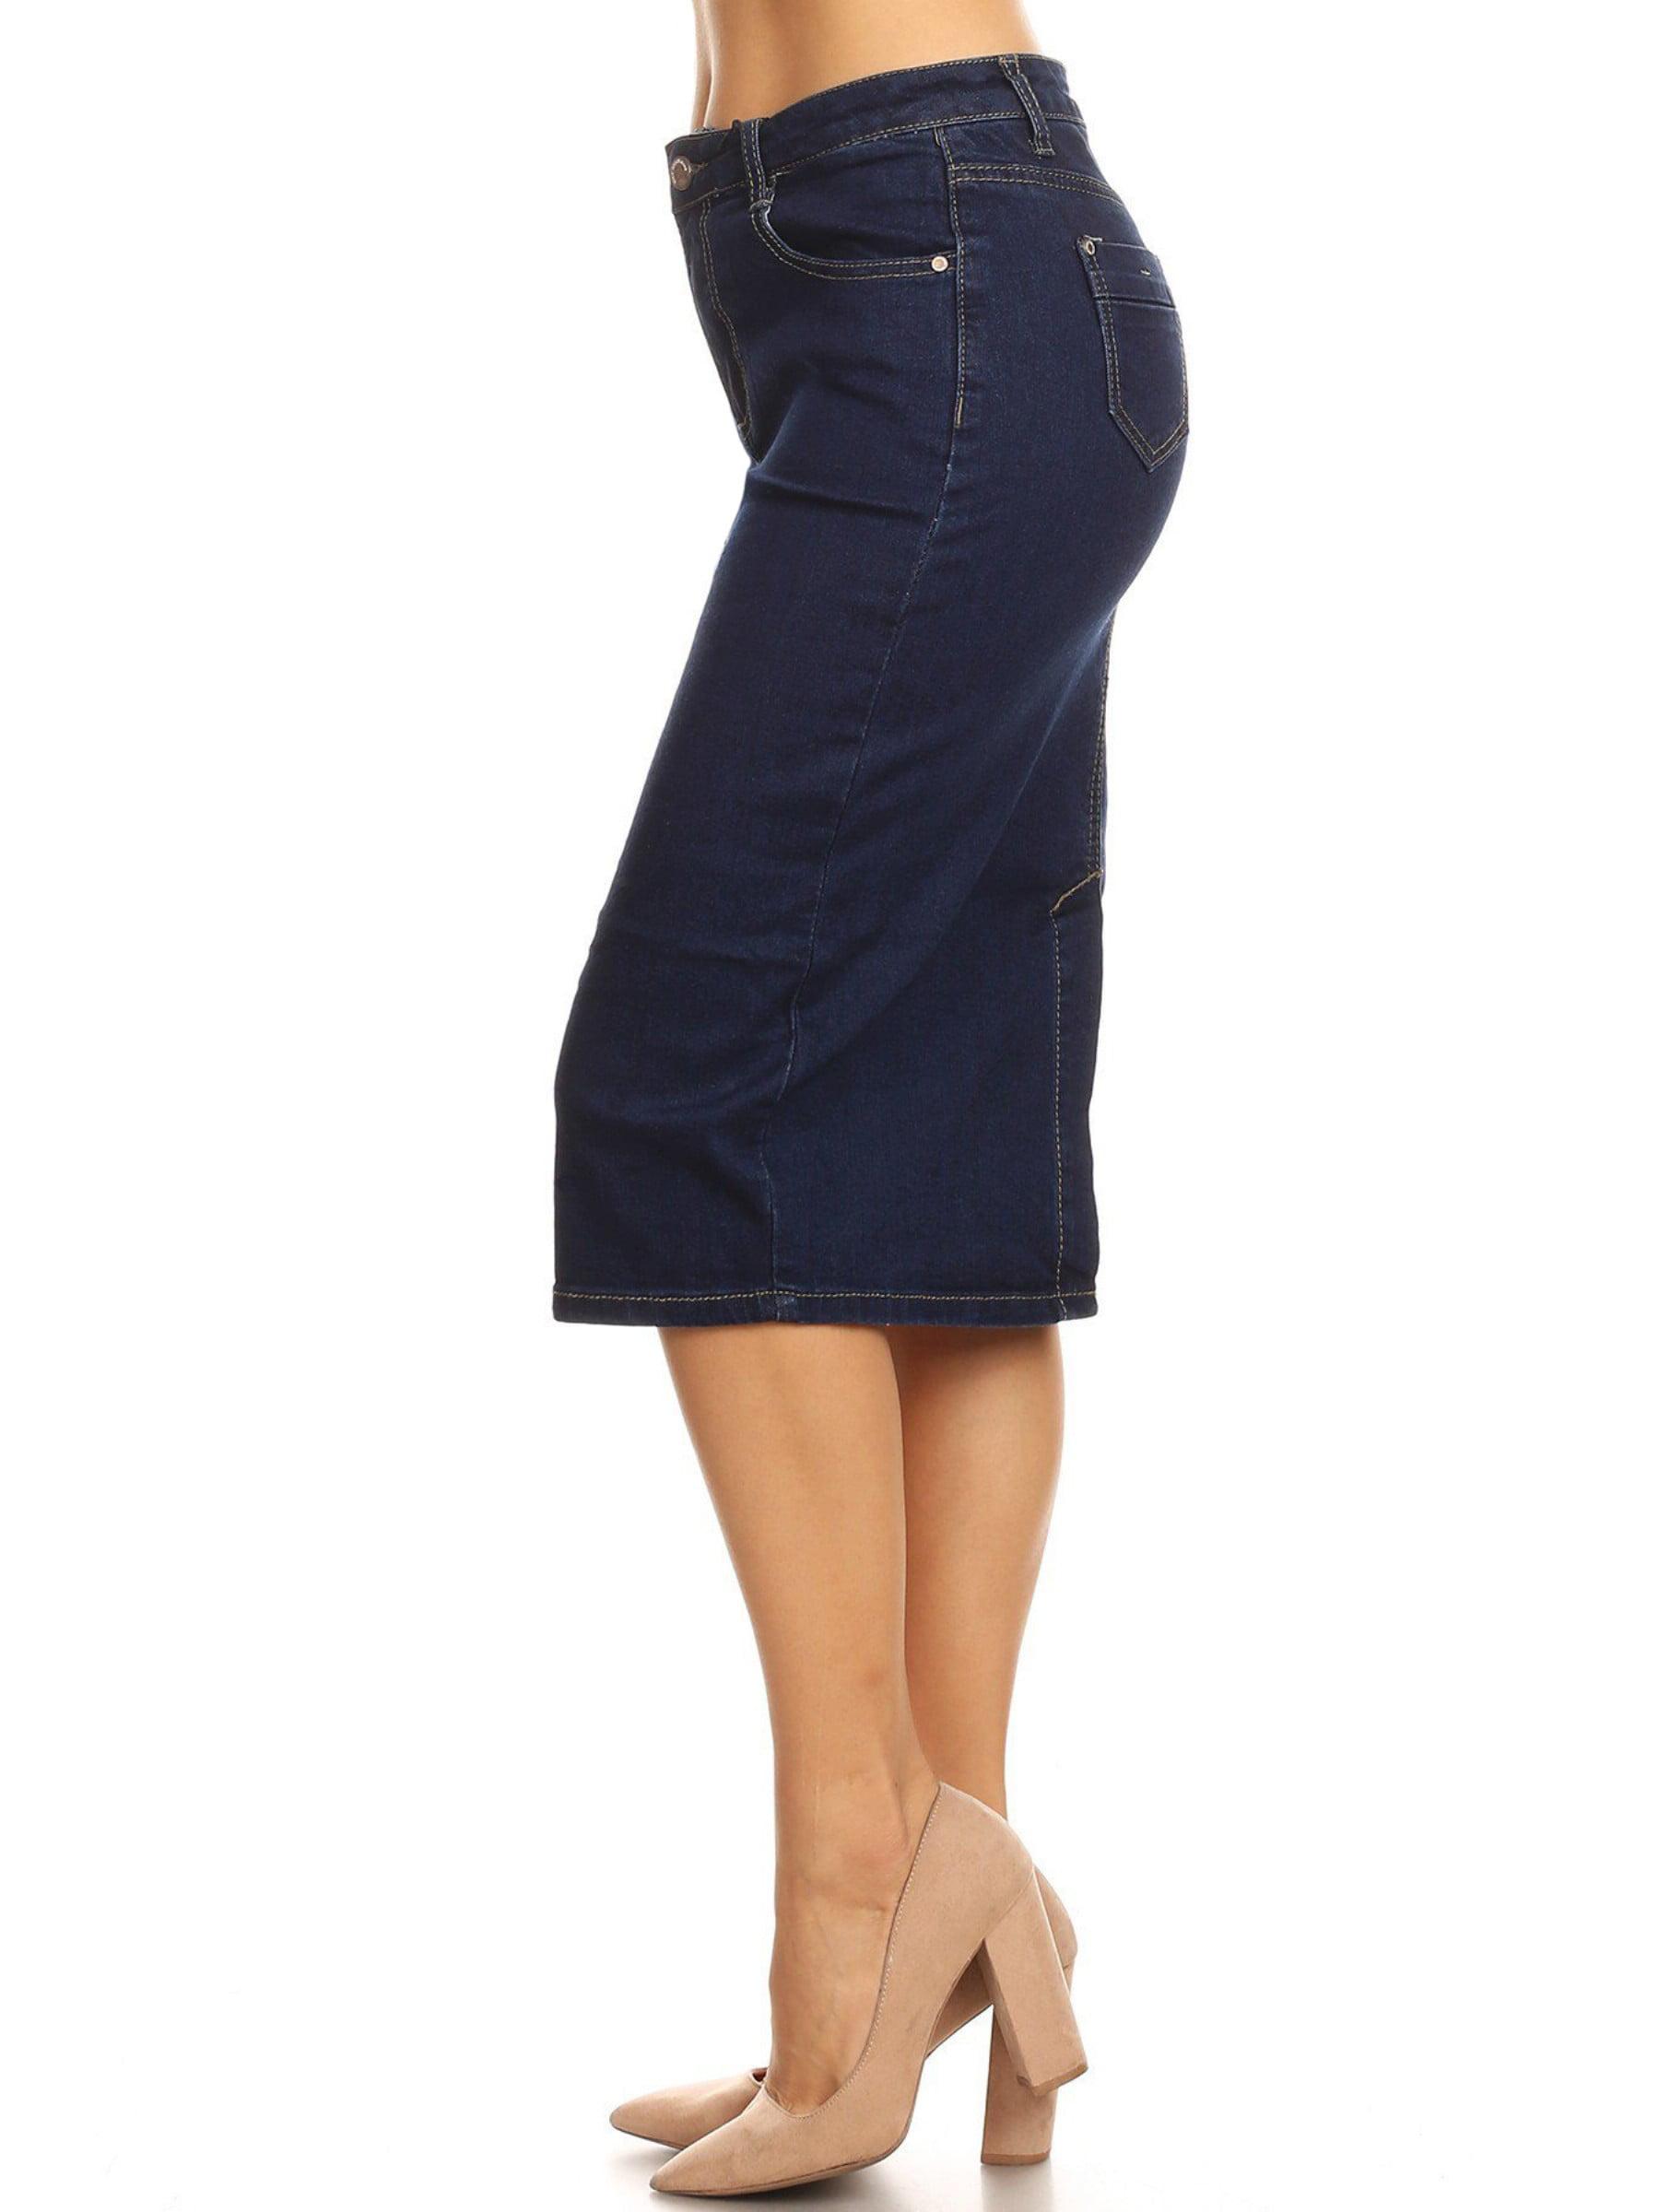 574f8b76b166 Knee Length Jean Skirts For Juniors – DACC